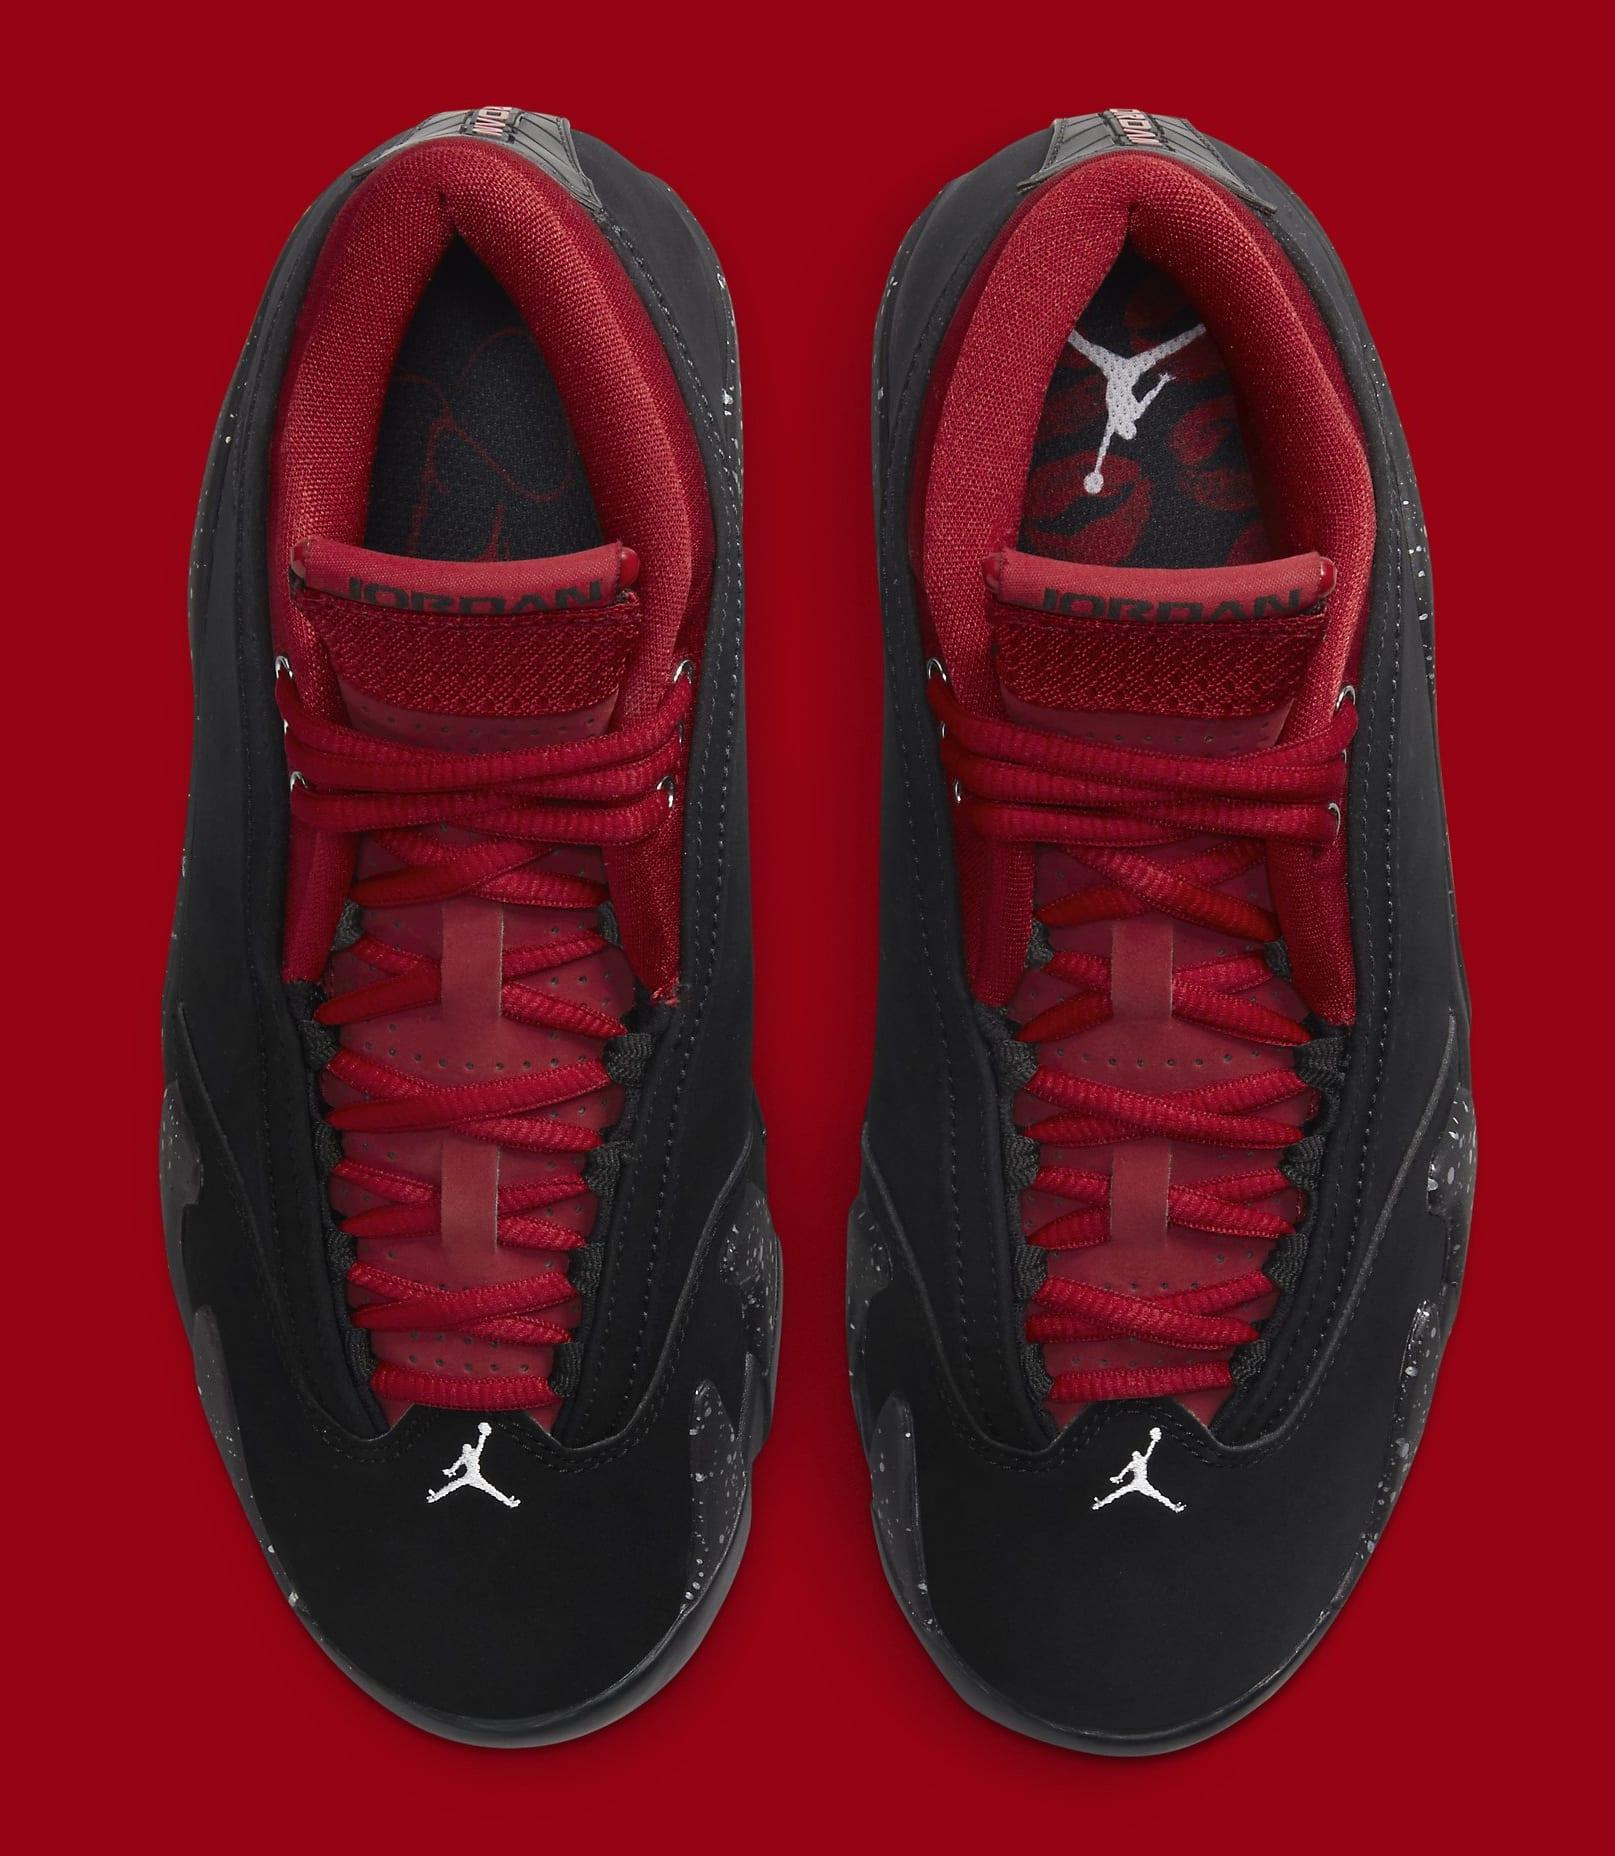 Air Jordan 14 Low Women's 'Red Lipstick' DH4121-006 Top